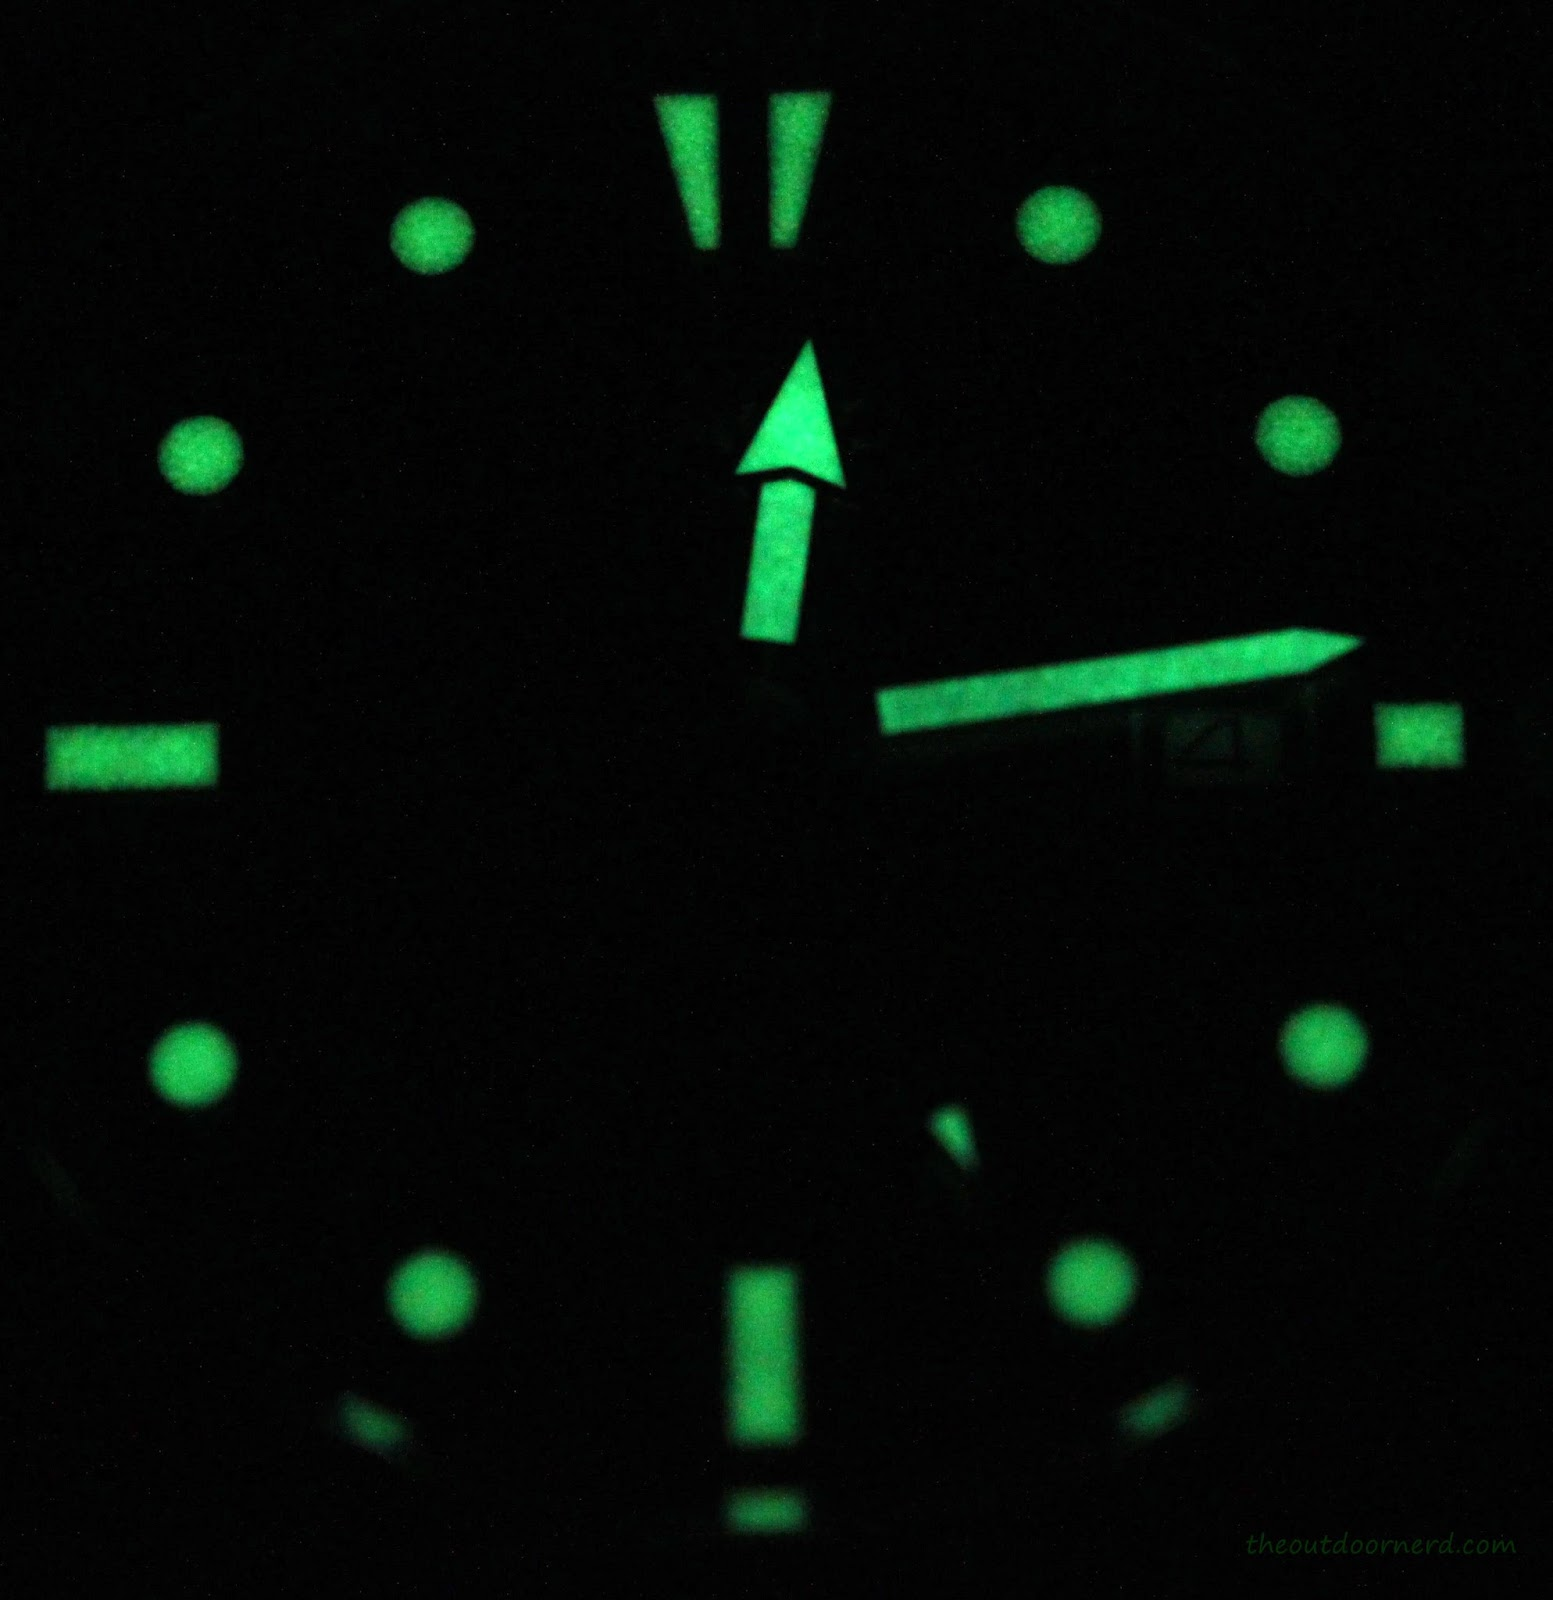 Casio MDV106-1A Diver's Watch: Glow in the Dark